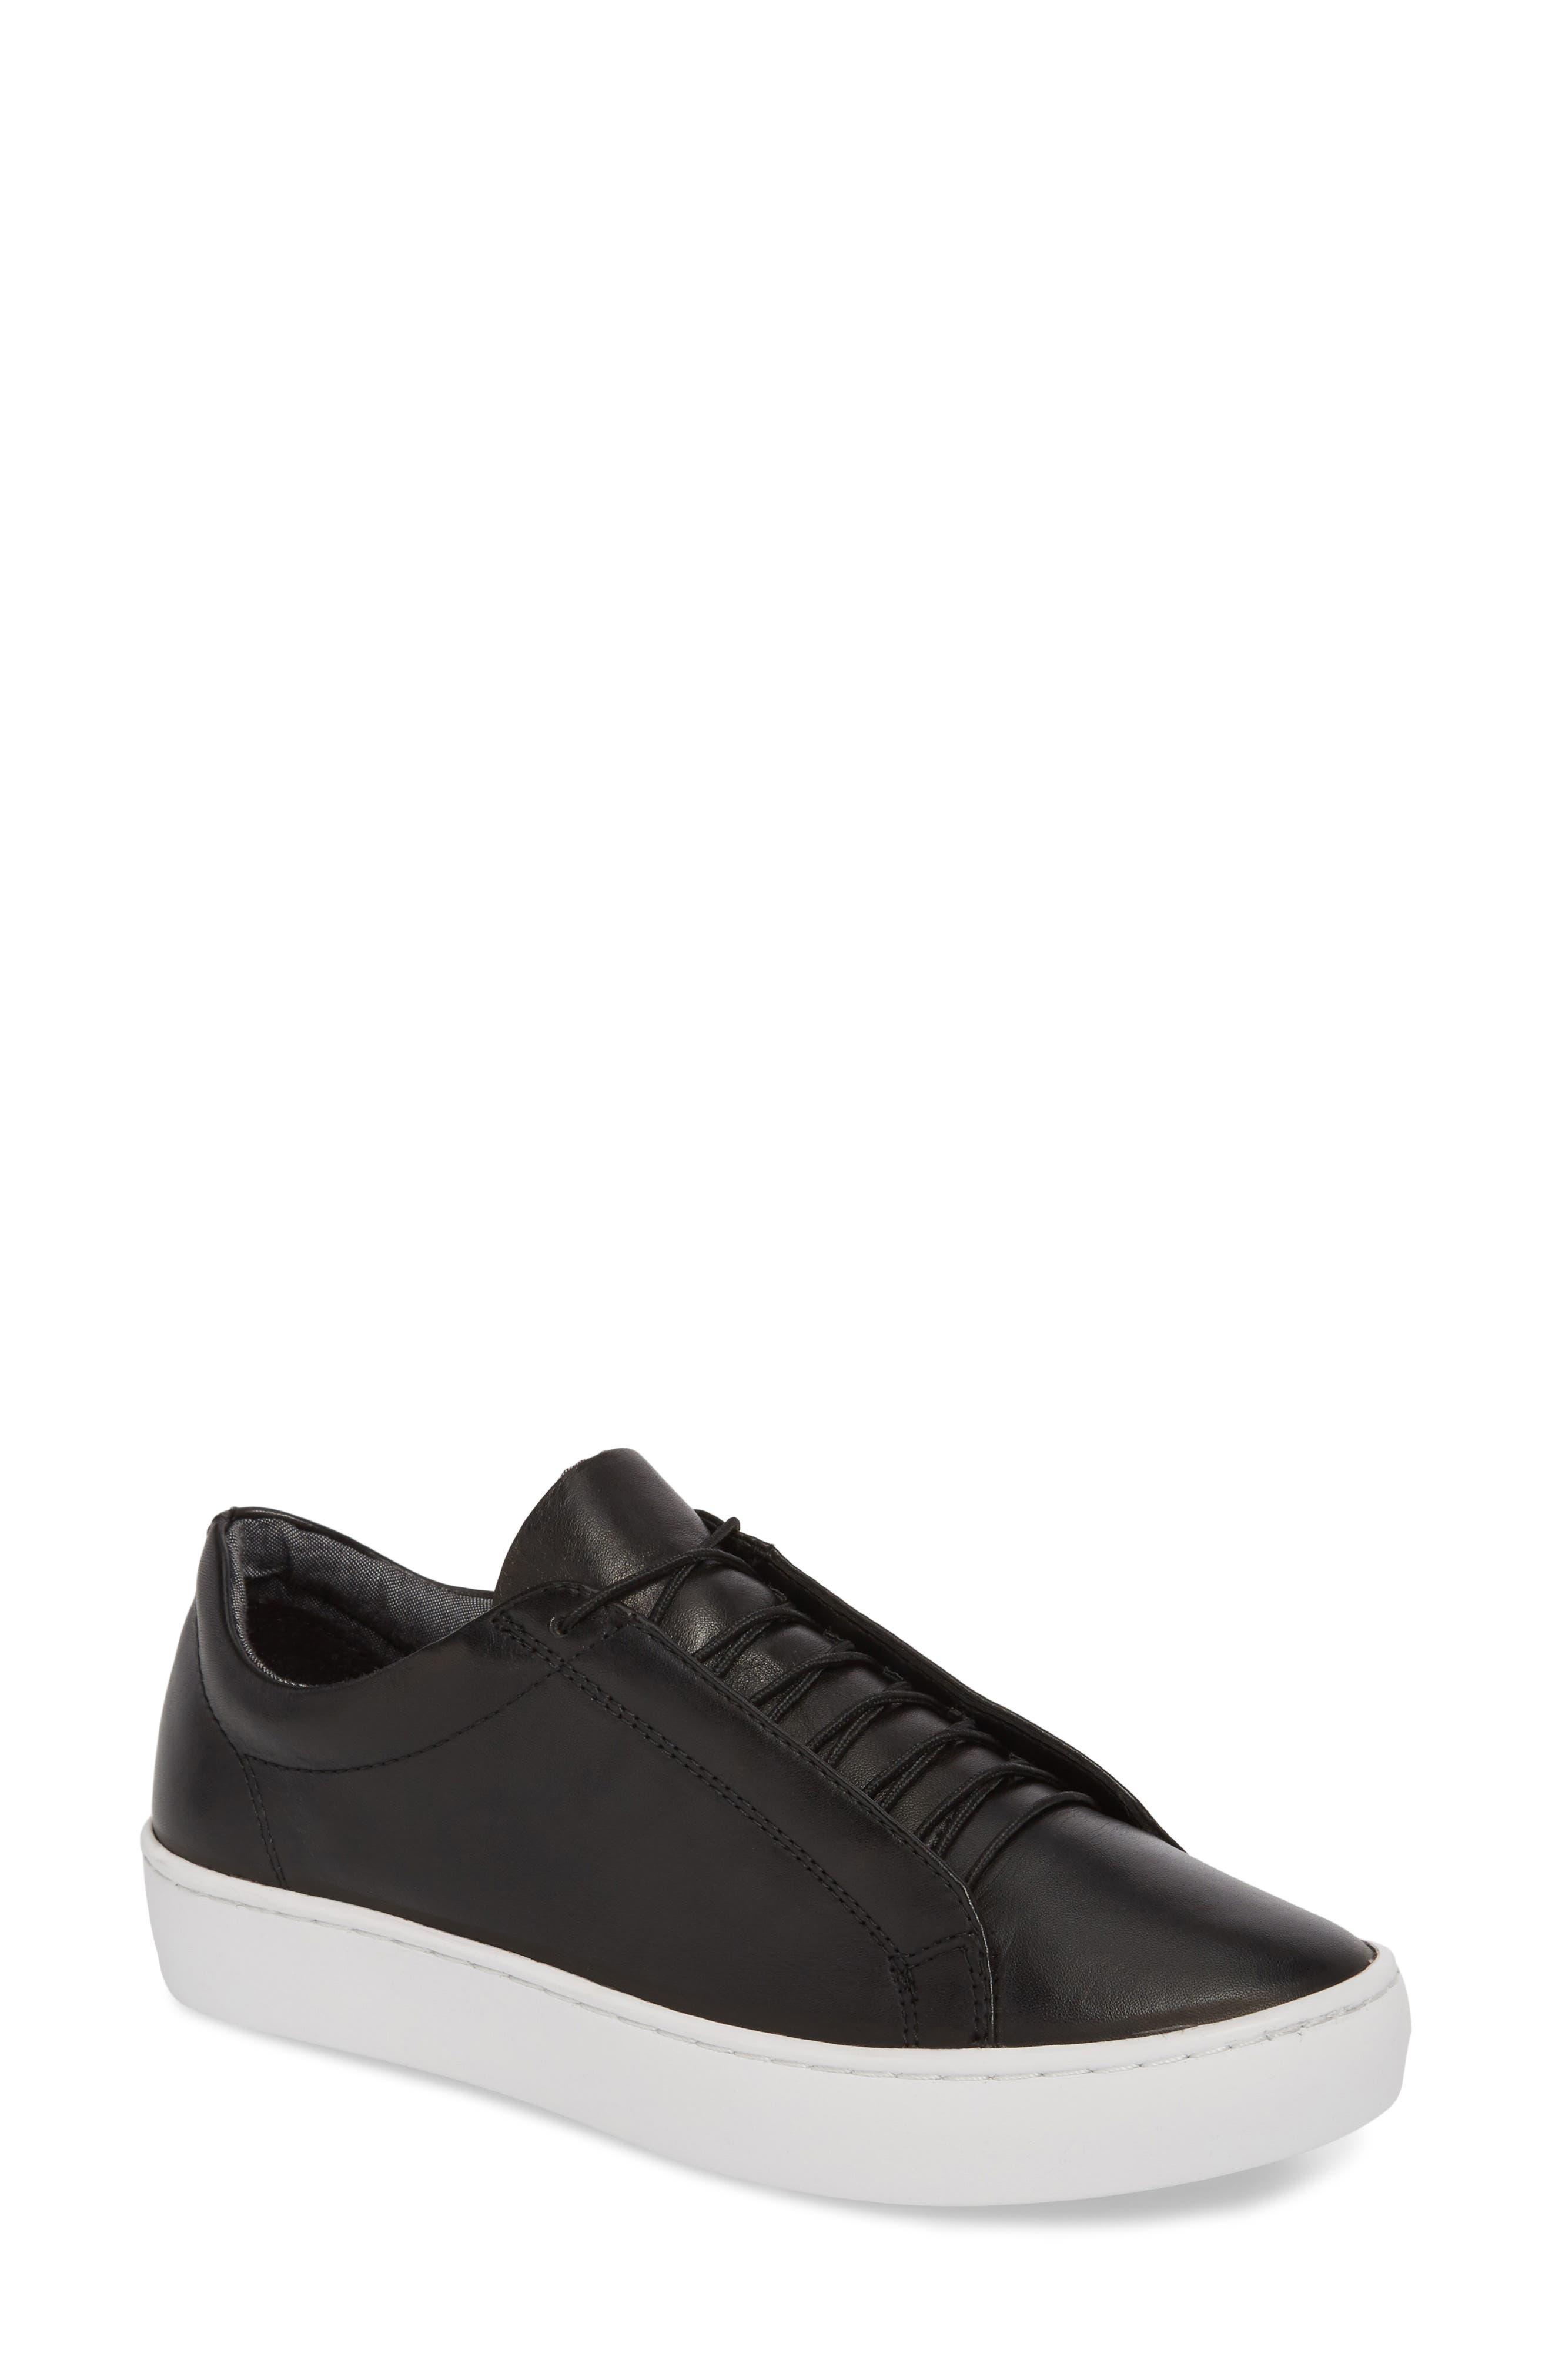 Zoe Sneaker,                         Main,                         color, BLACK LEATHER